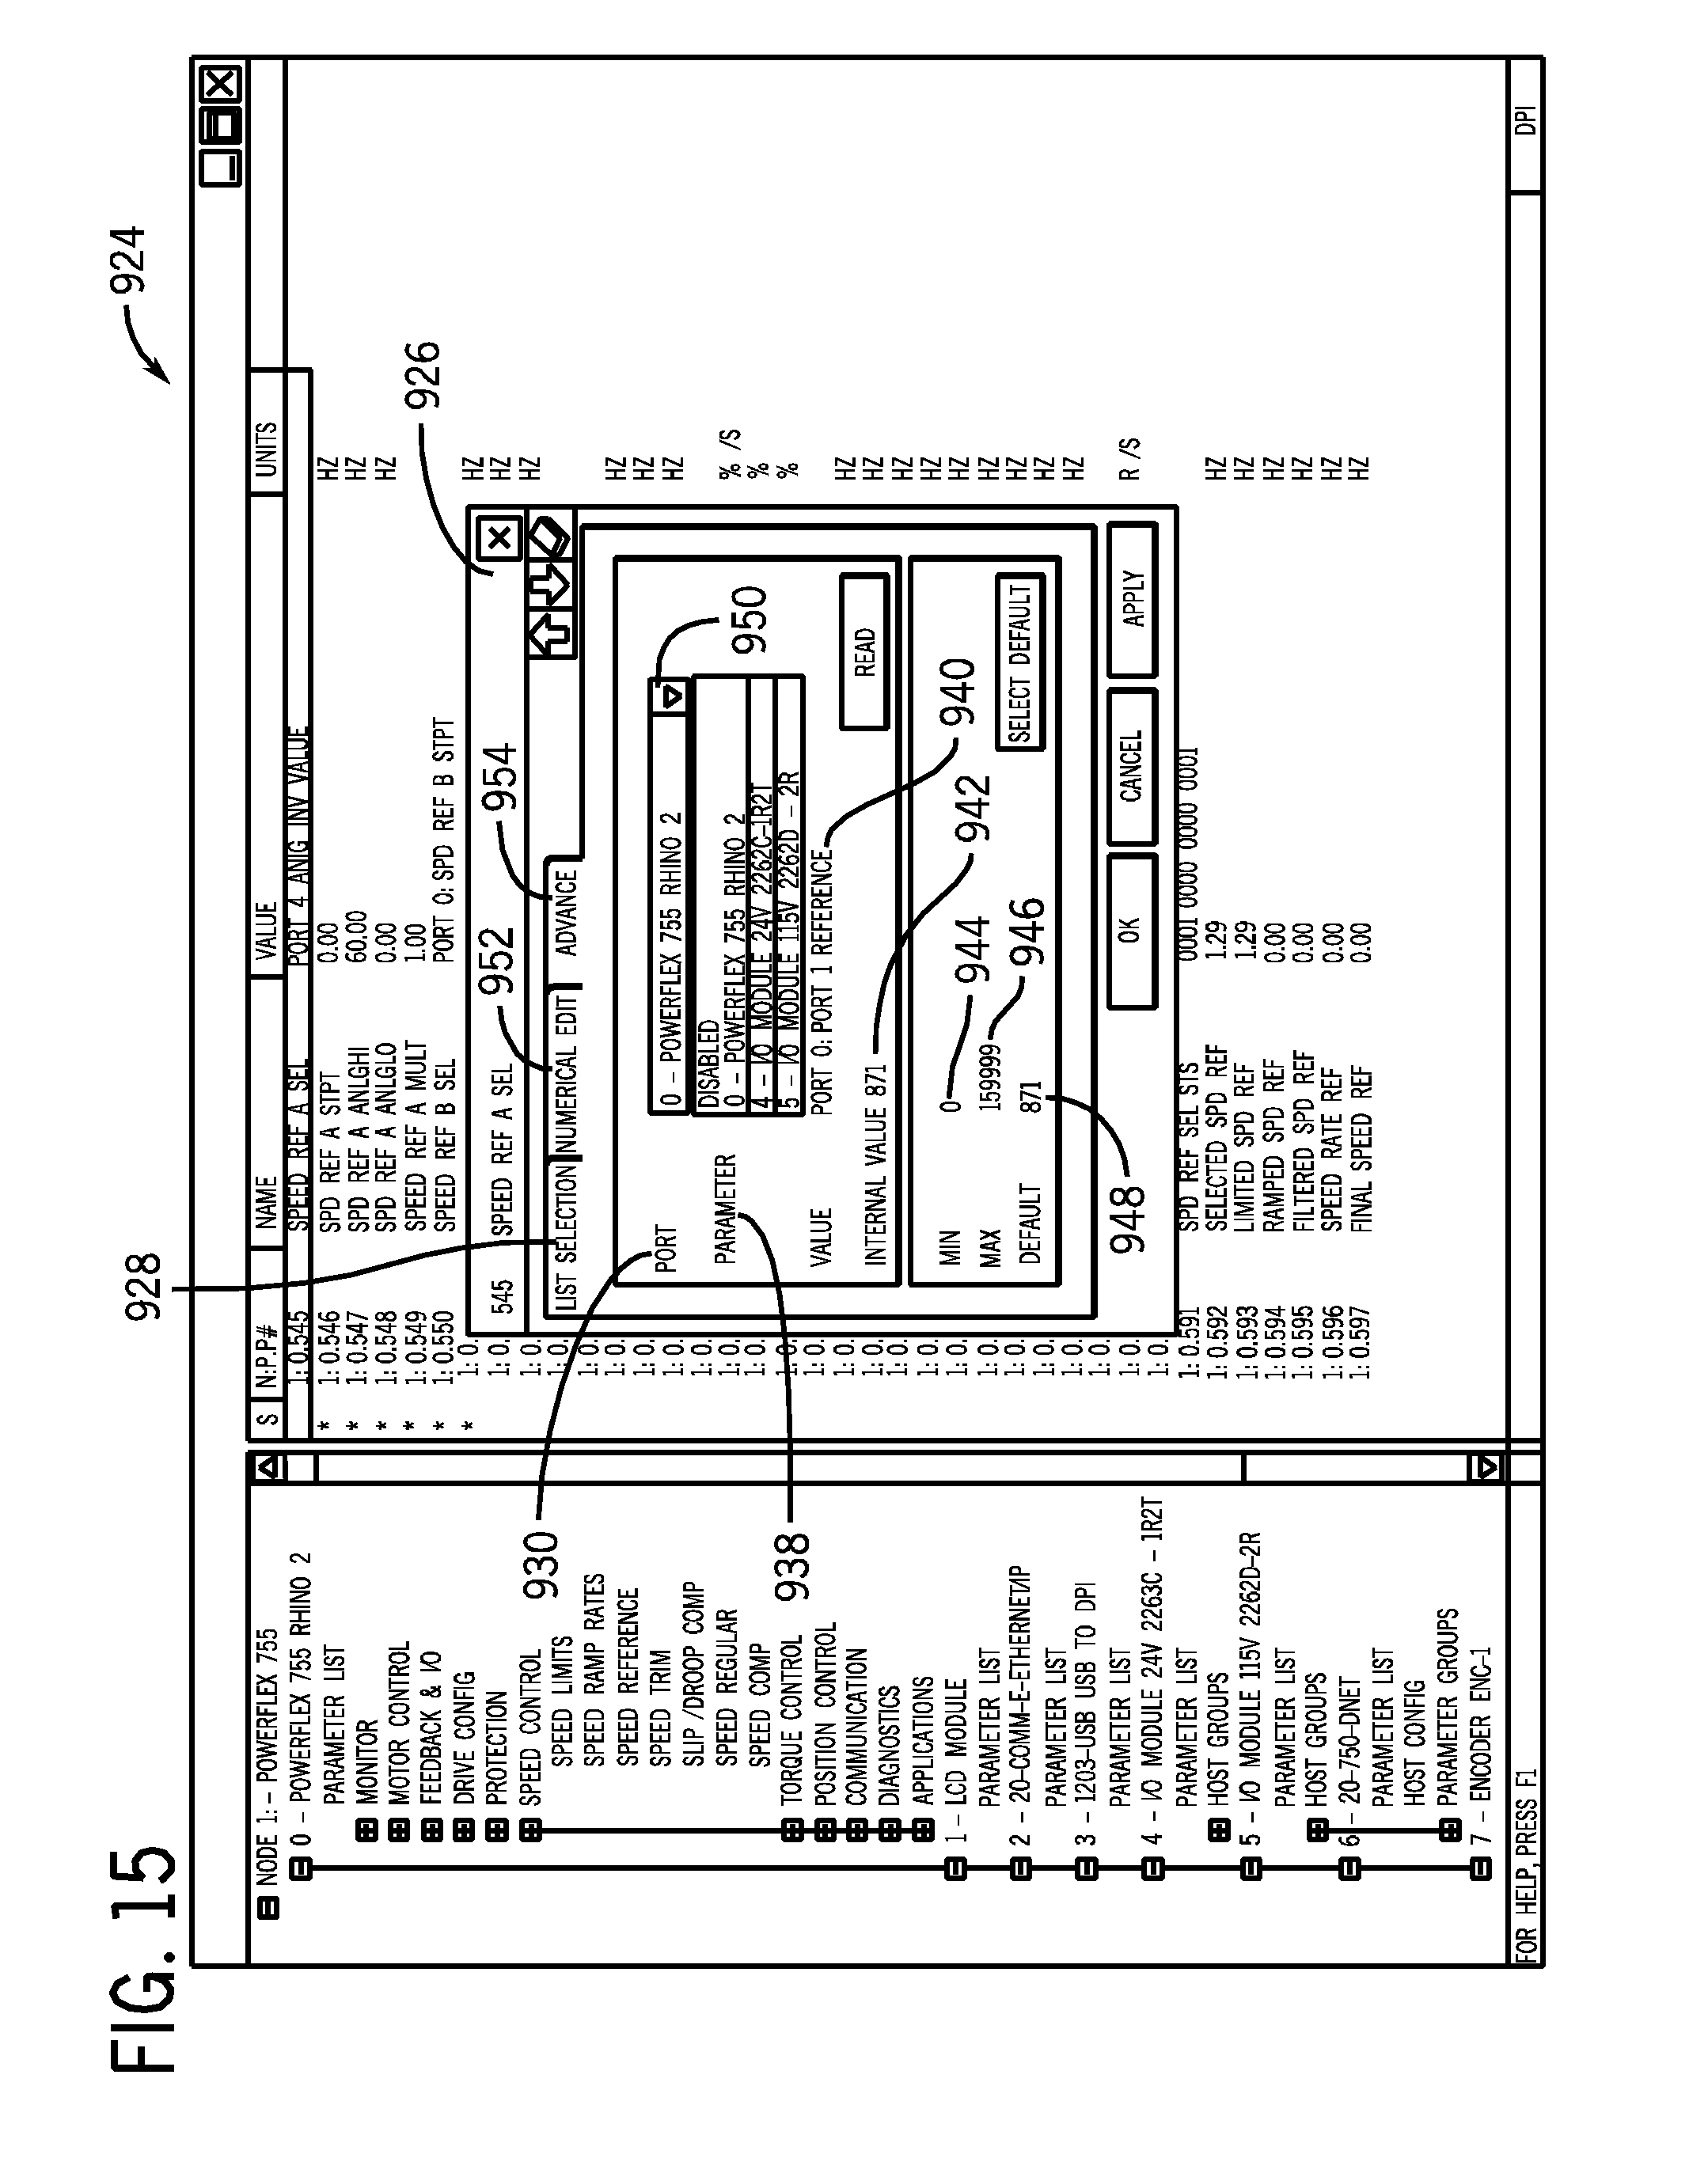 Powerflex 755 Wiring Diagrams Great Design Of Diagram 700 525 Safety Mcc Installation Manual